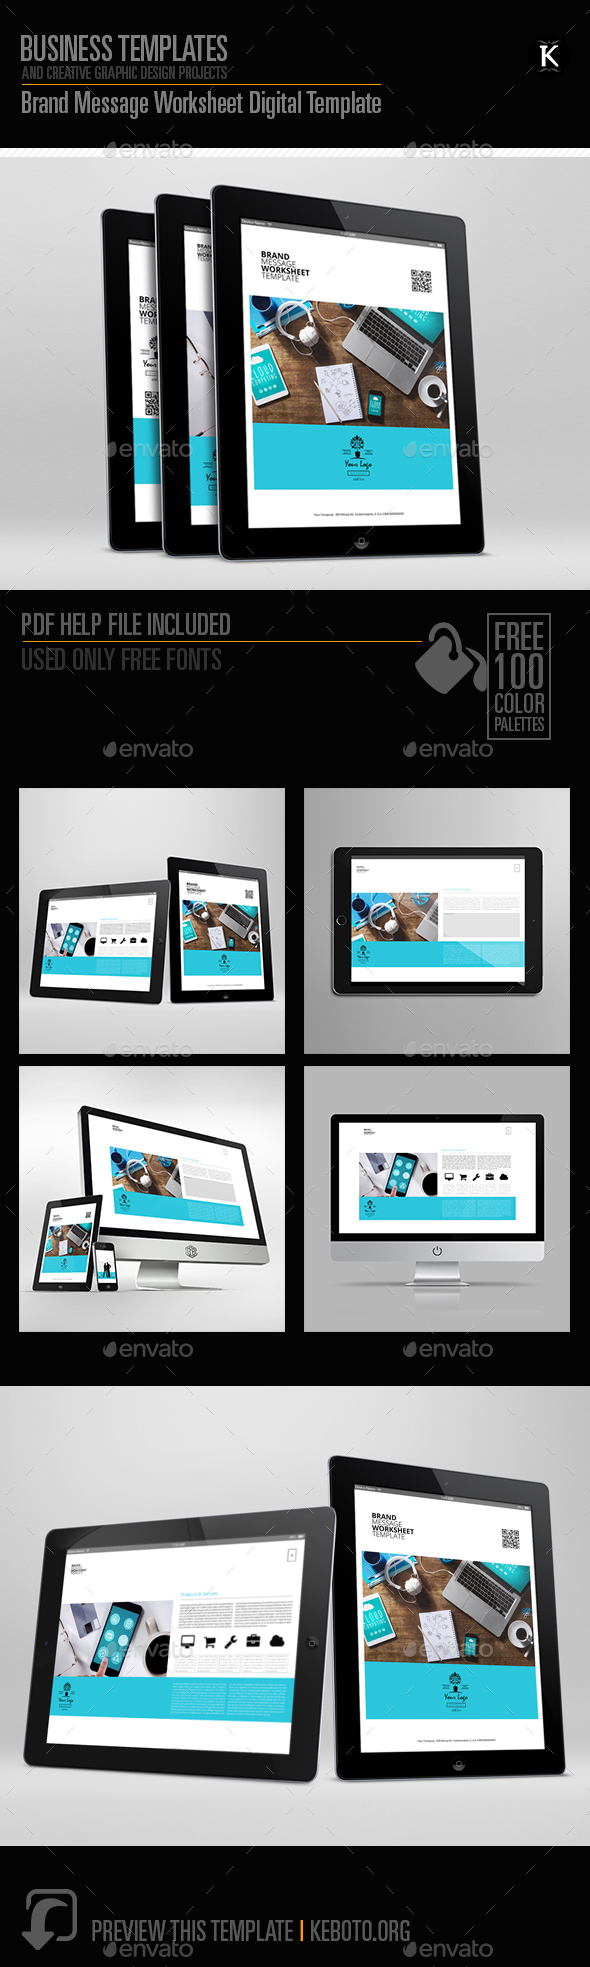 Brand Message Worksheet Digital Template - ePublishing